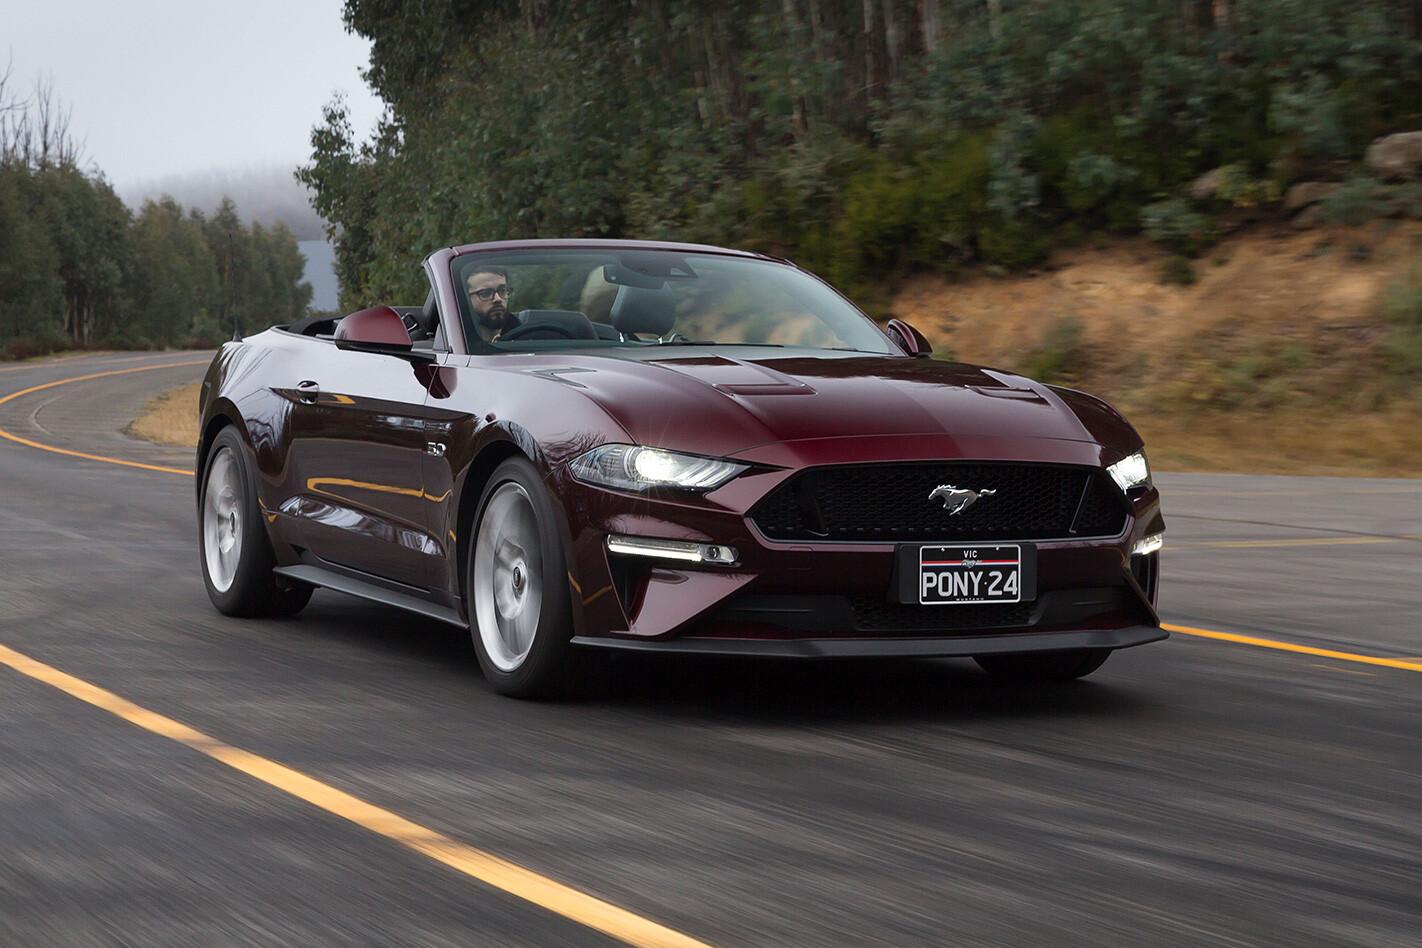 Ford Mustang Convertible Jpg